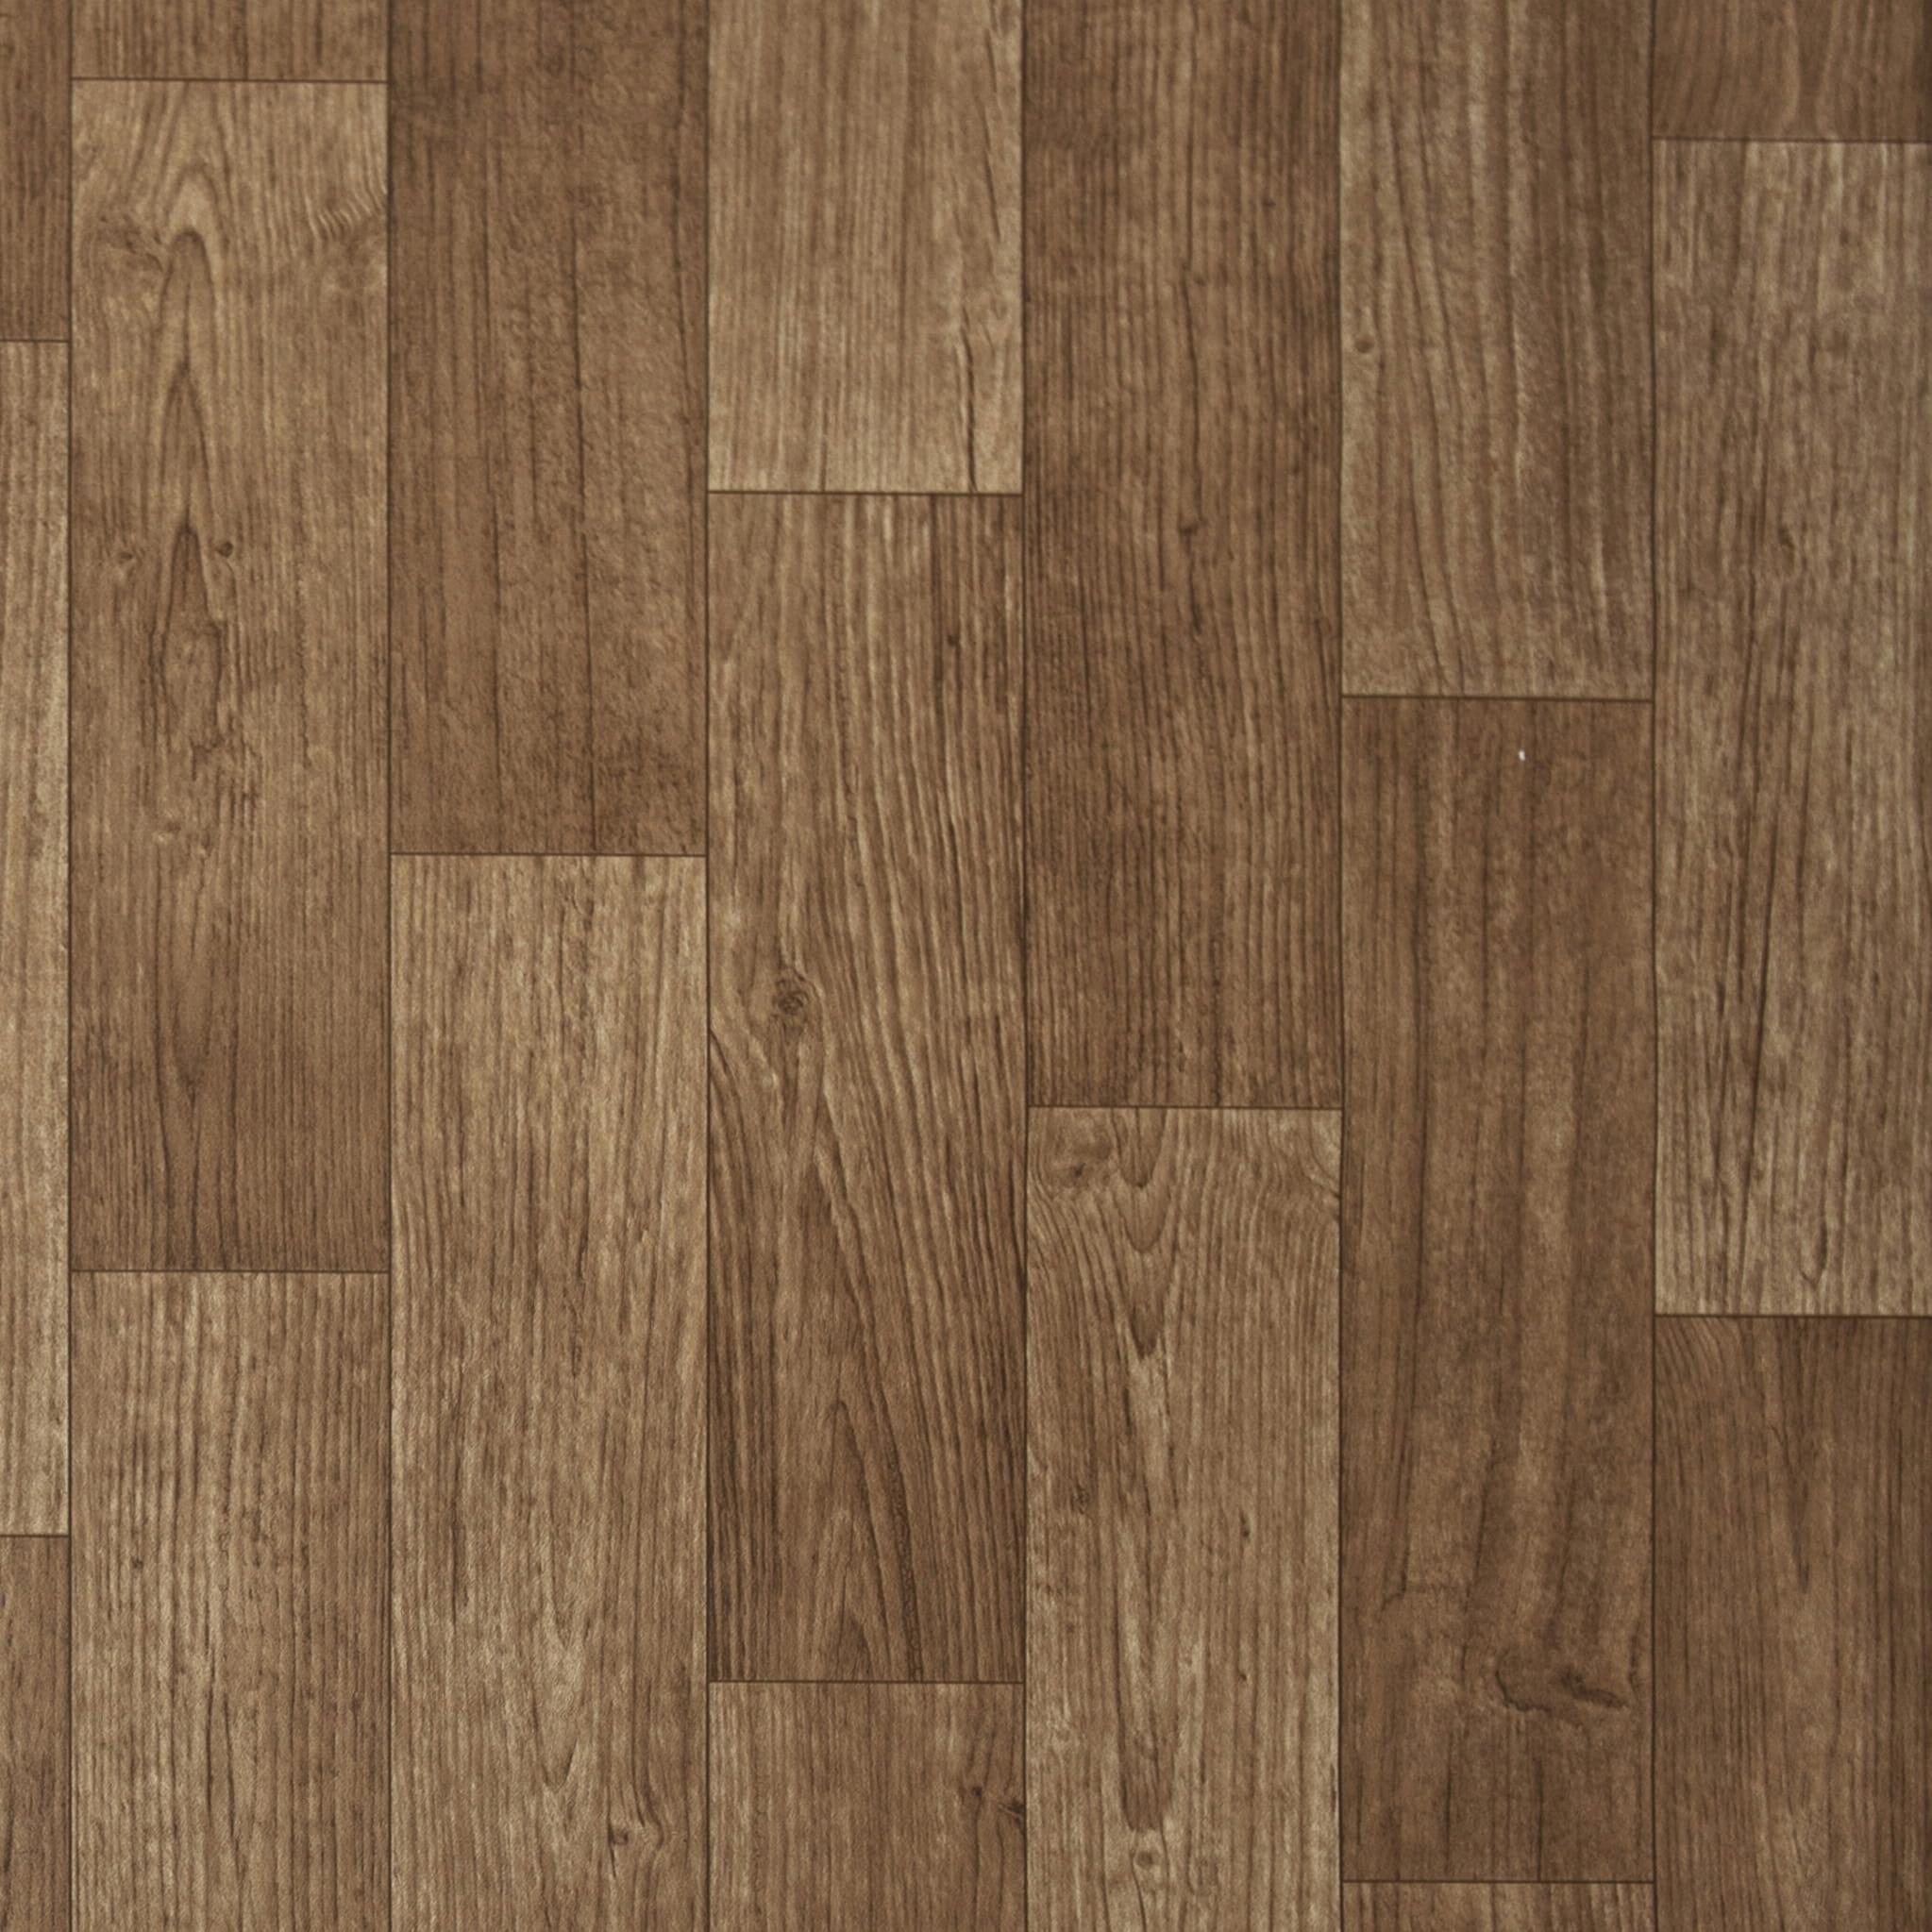 Wykładzina PCV linoleum gumolit brąz drewno 2m